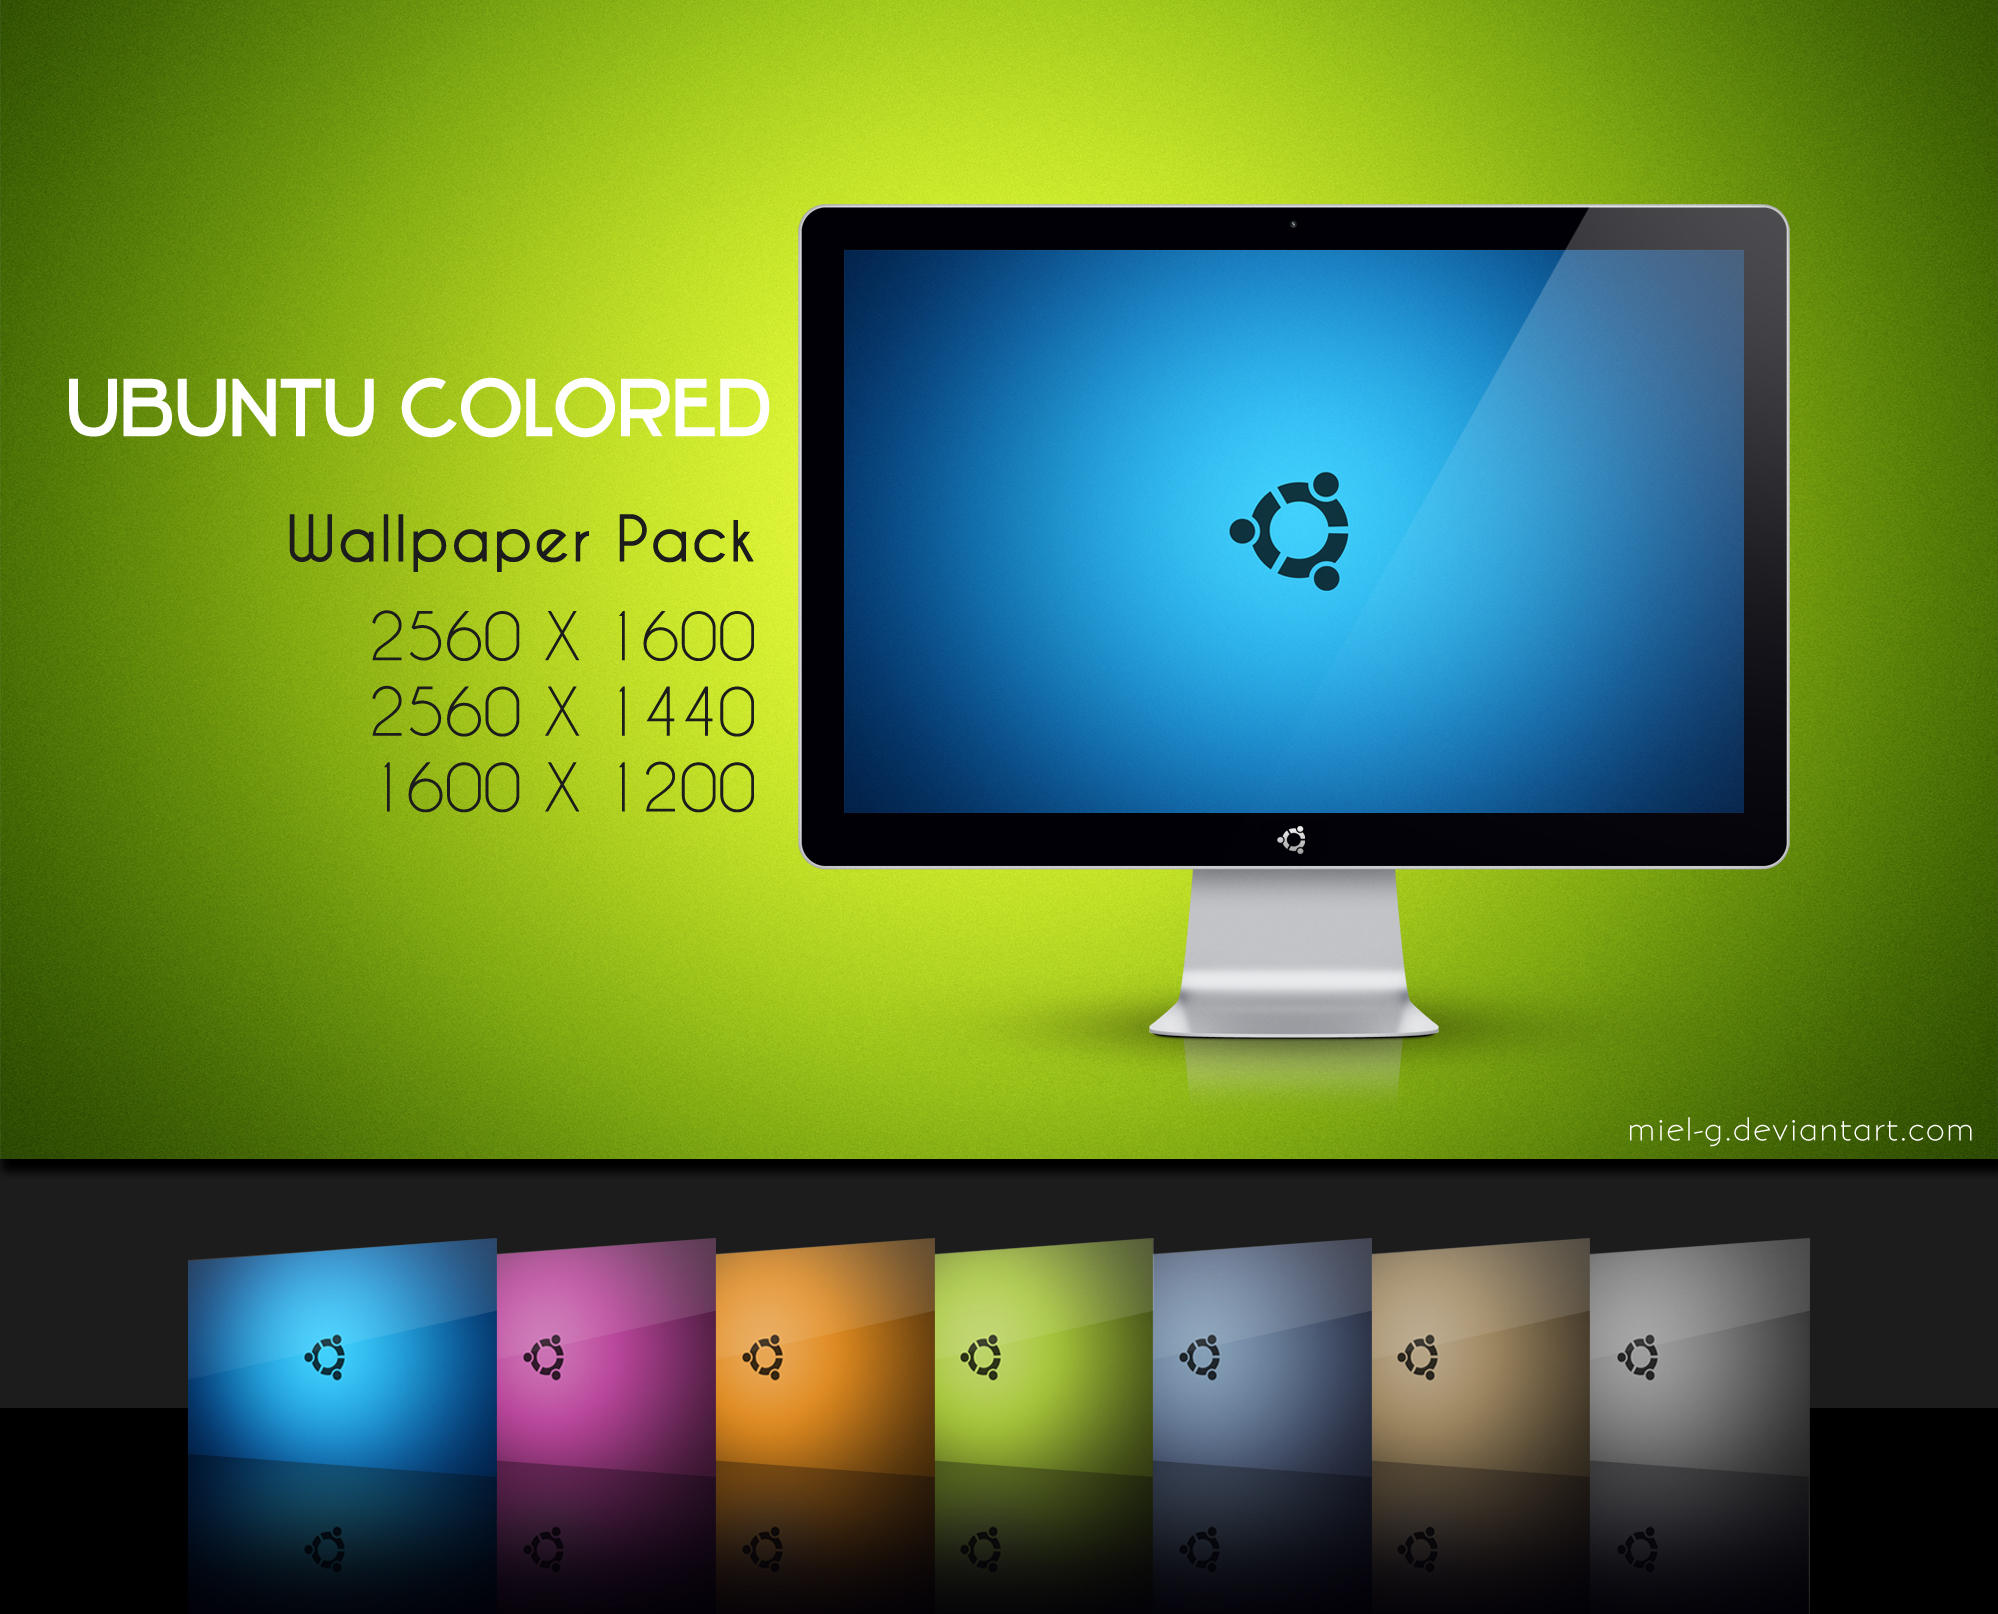 Ubuntu Colored by miel-g